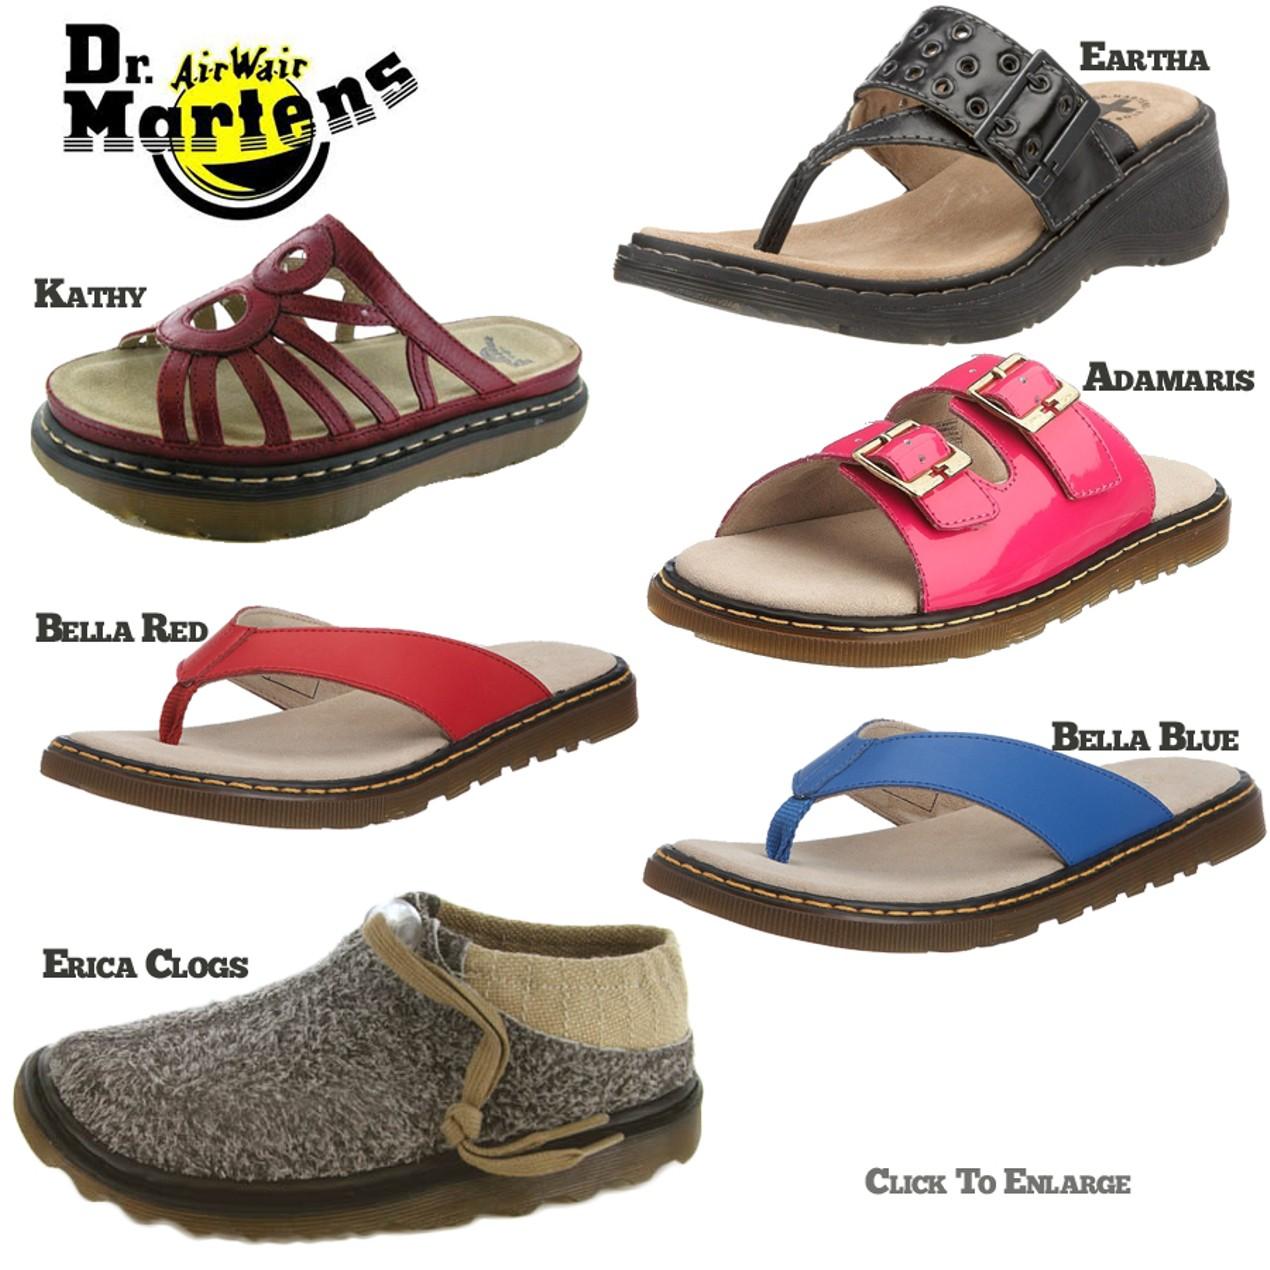 0262fad5ecb6e Dr. Martens Women's Shoes - Tanga